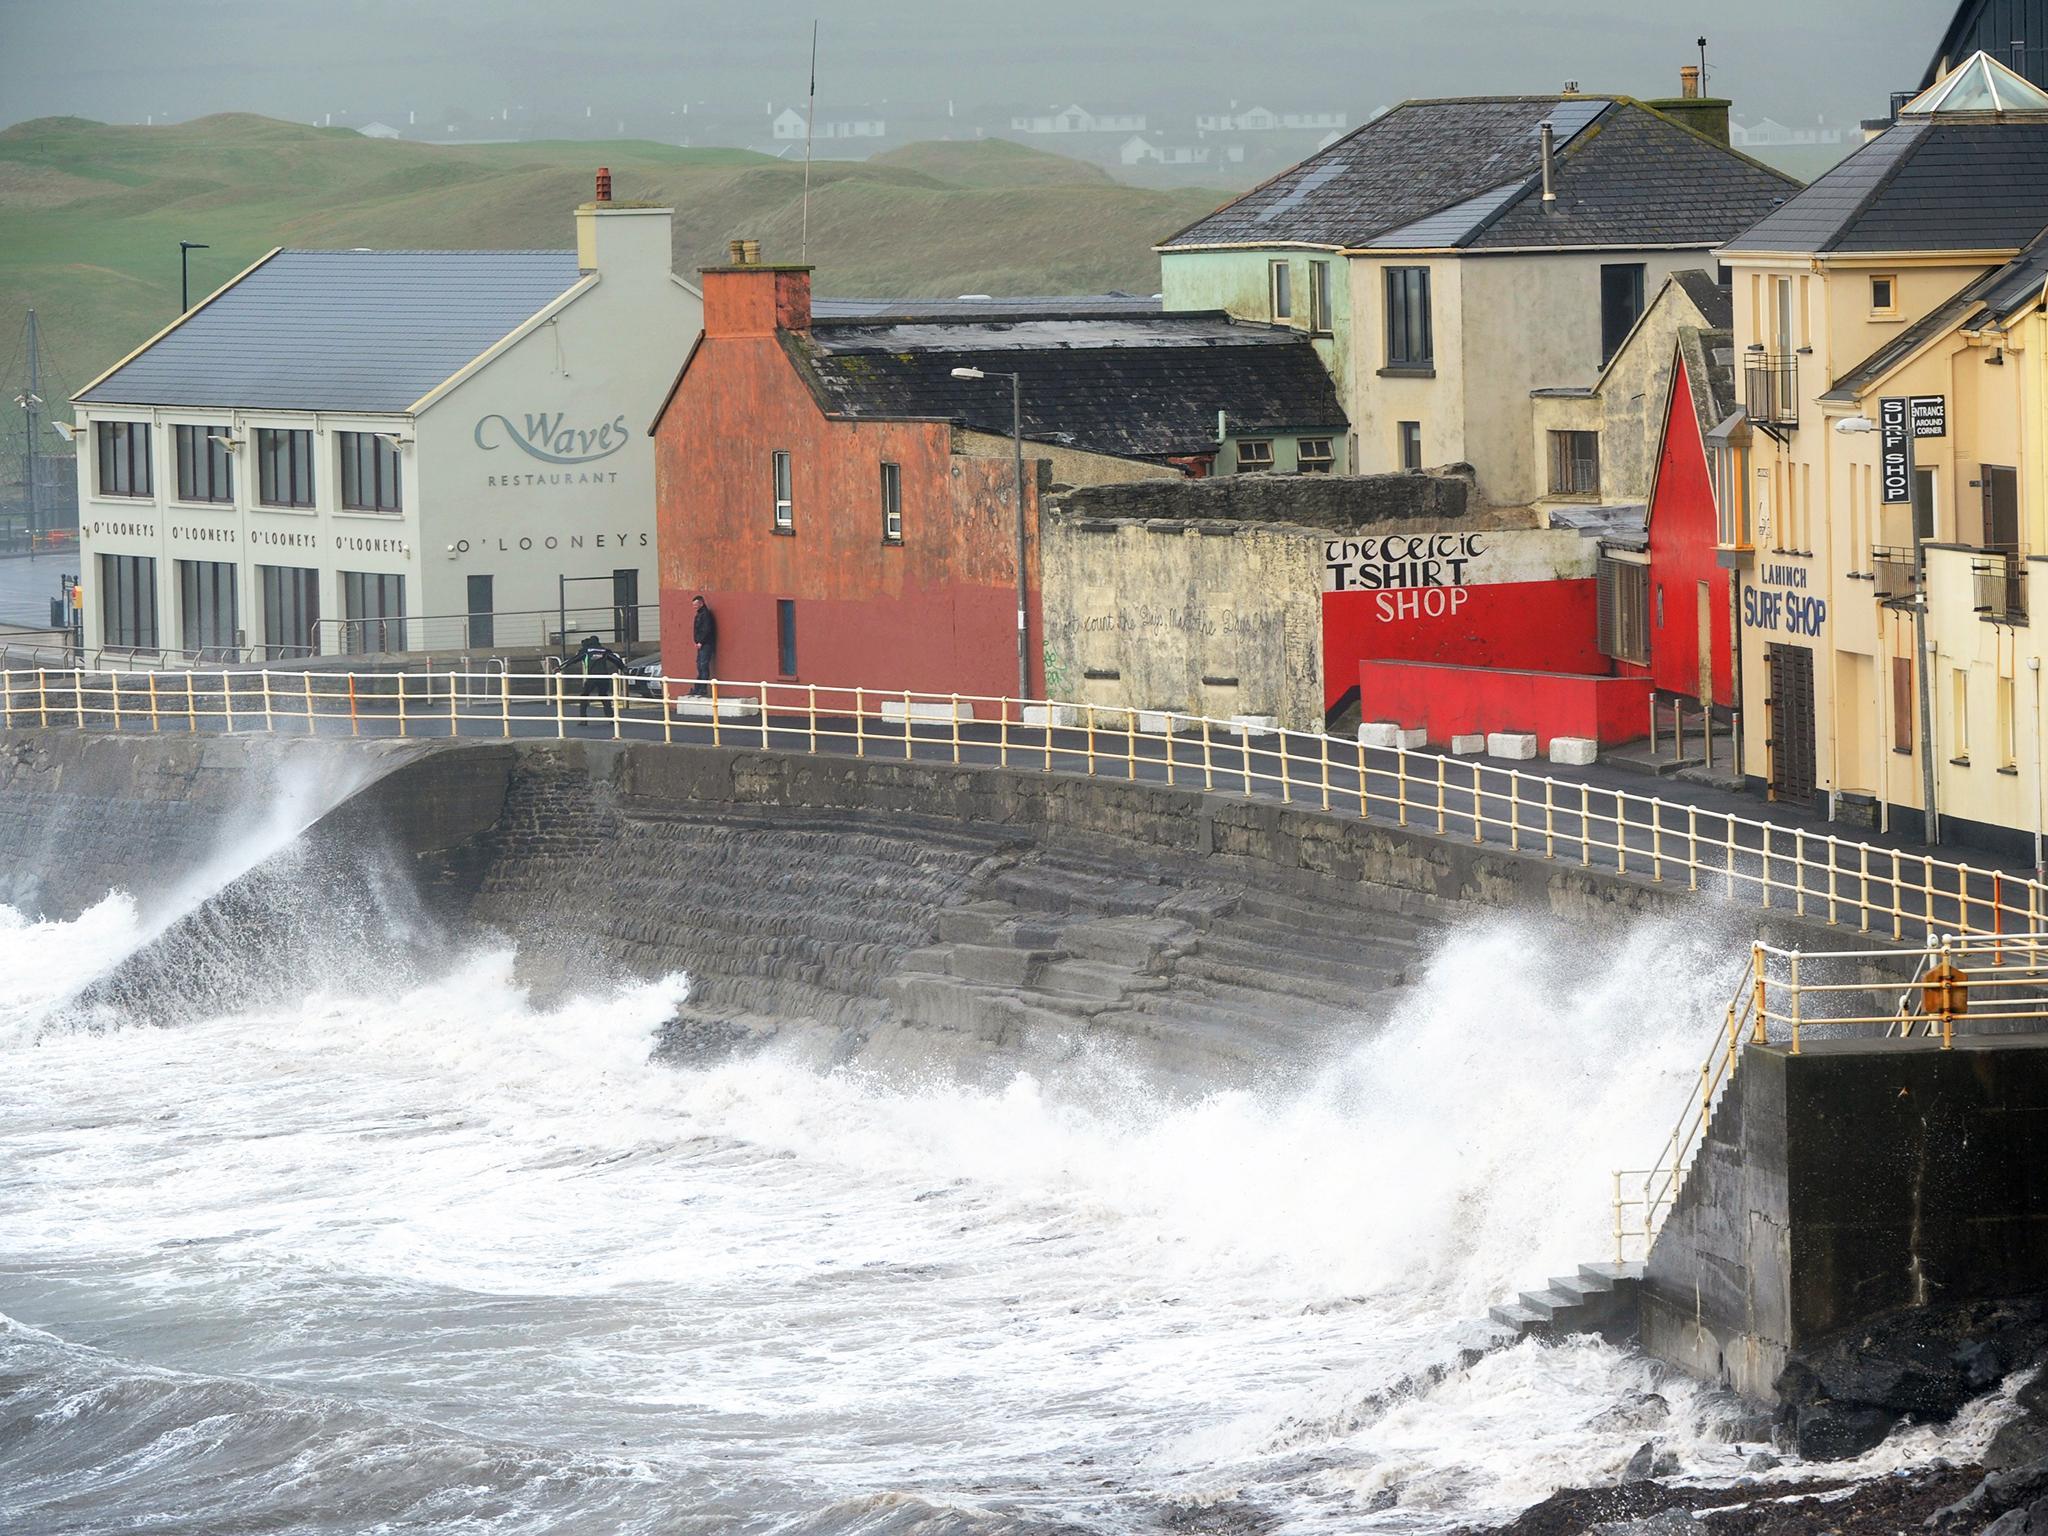 Death toll rises as Ophelia ravages Ireland